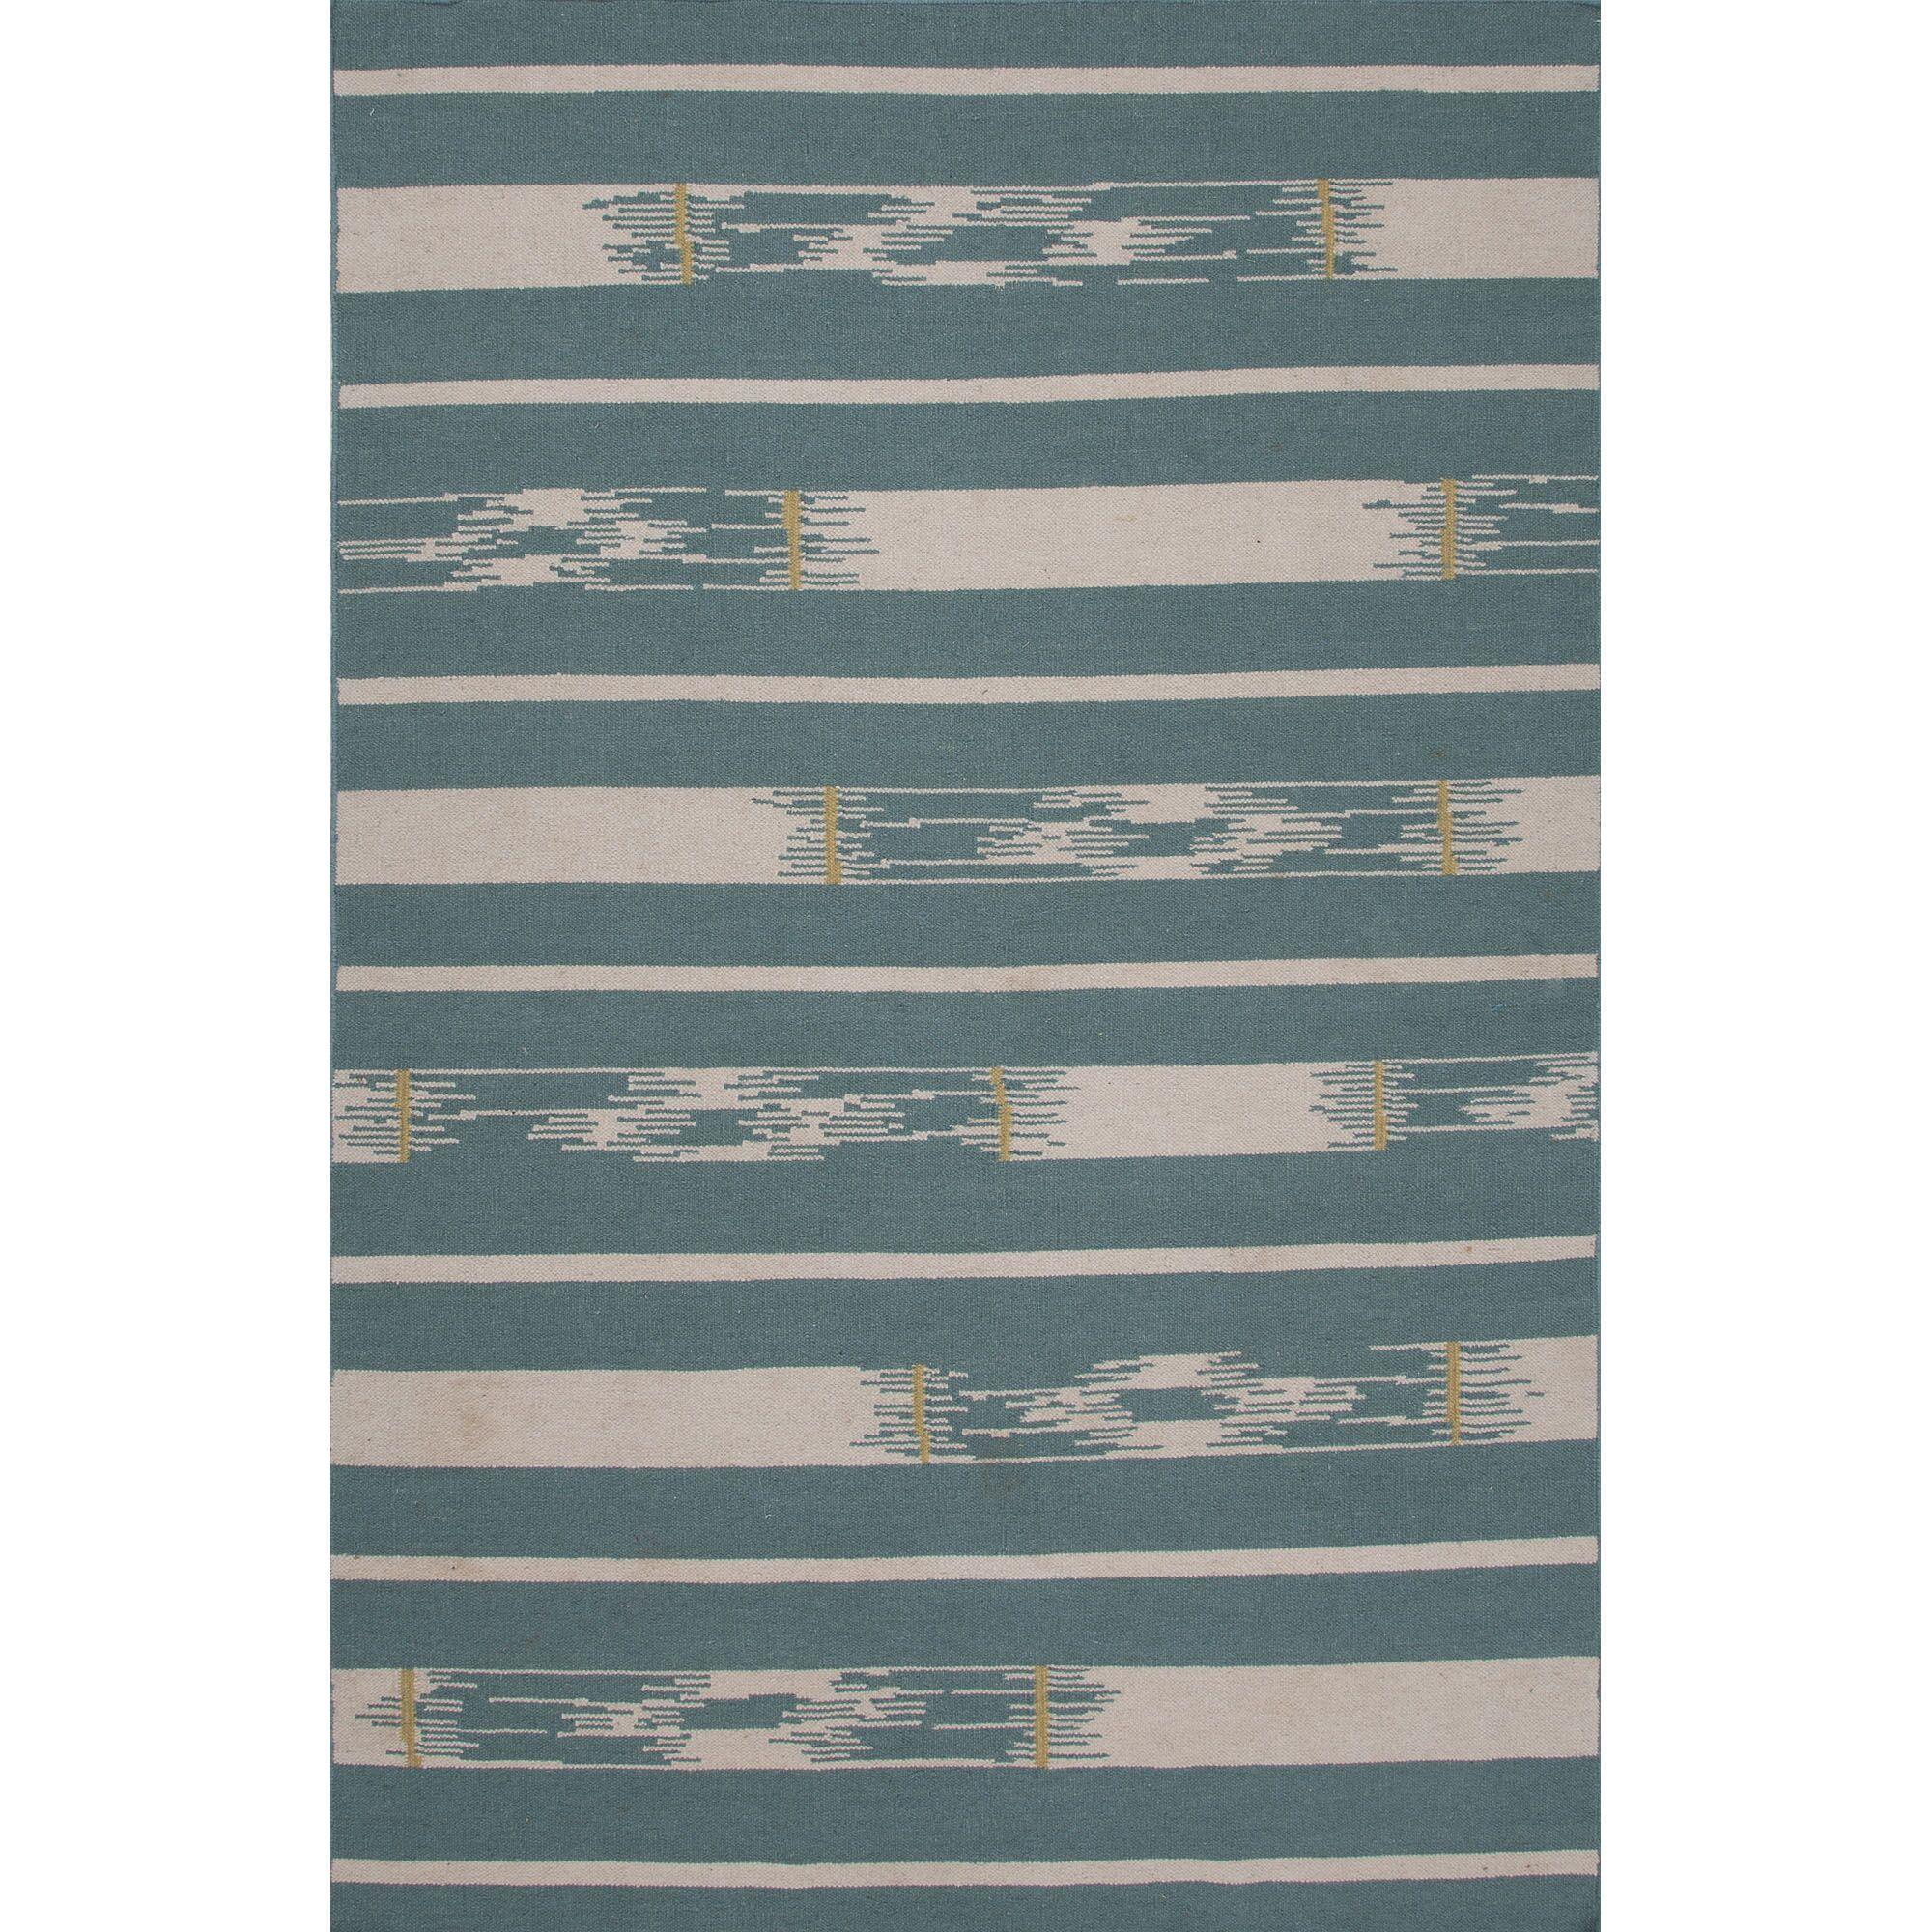 Camarillo Wool Flat Weave Blue/Ivory Area Rug Rug Size: 5' x 8'